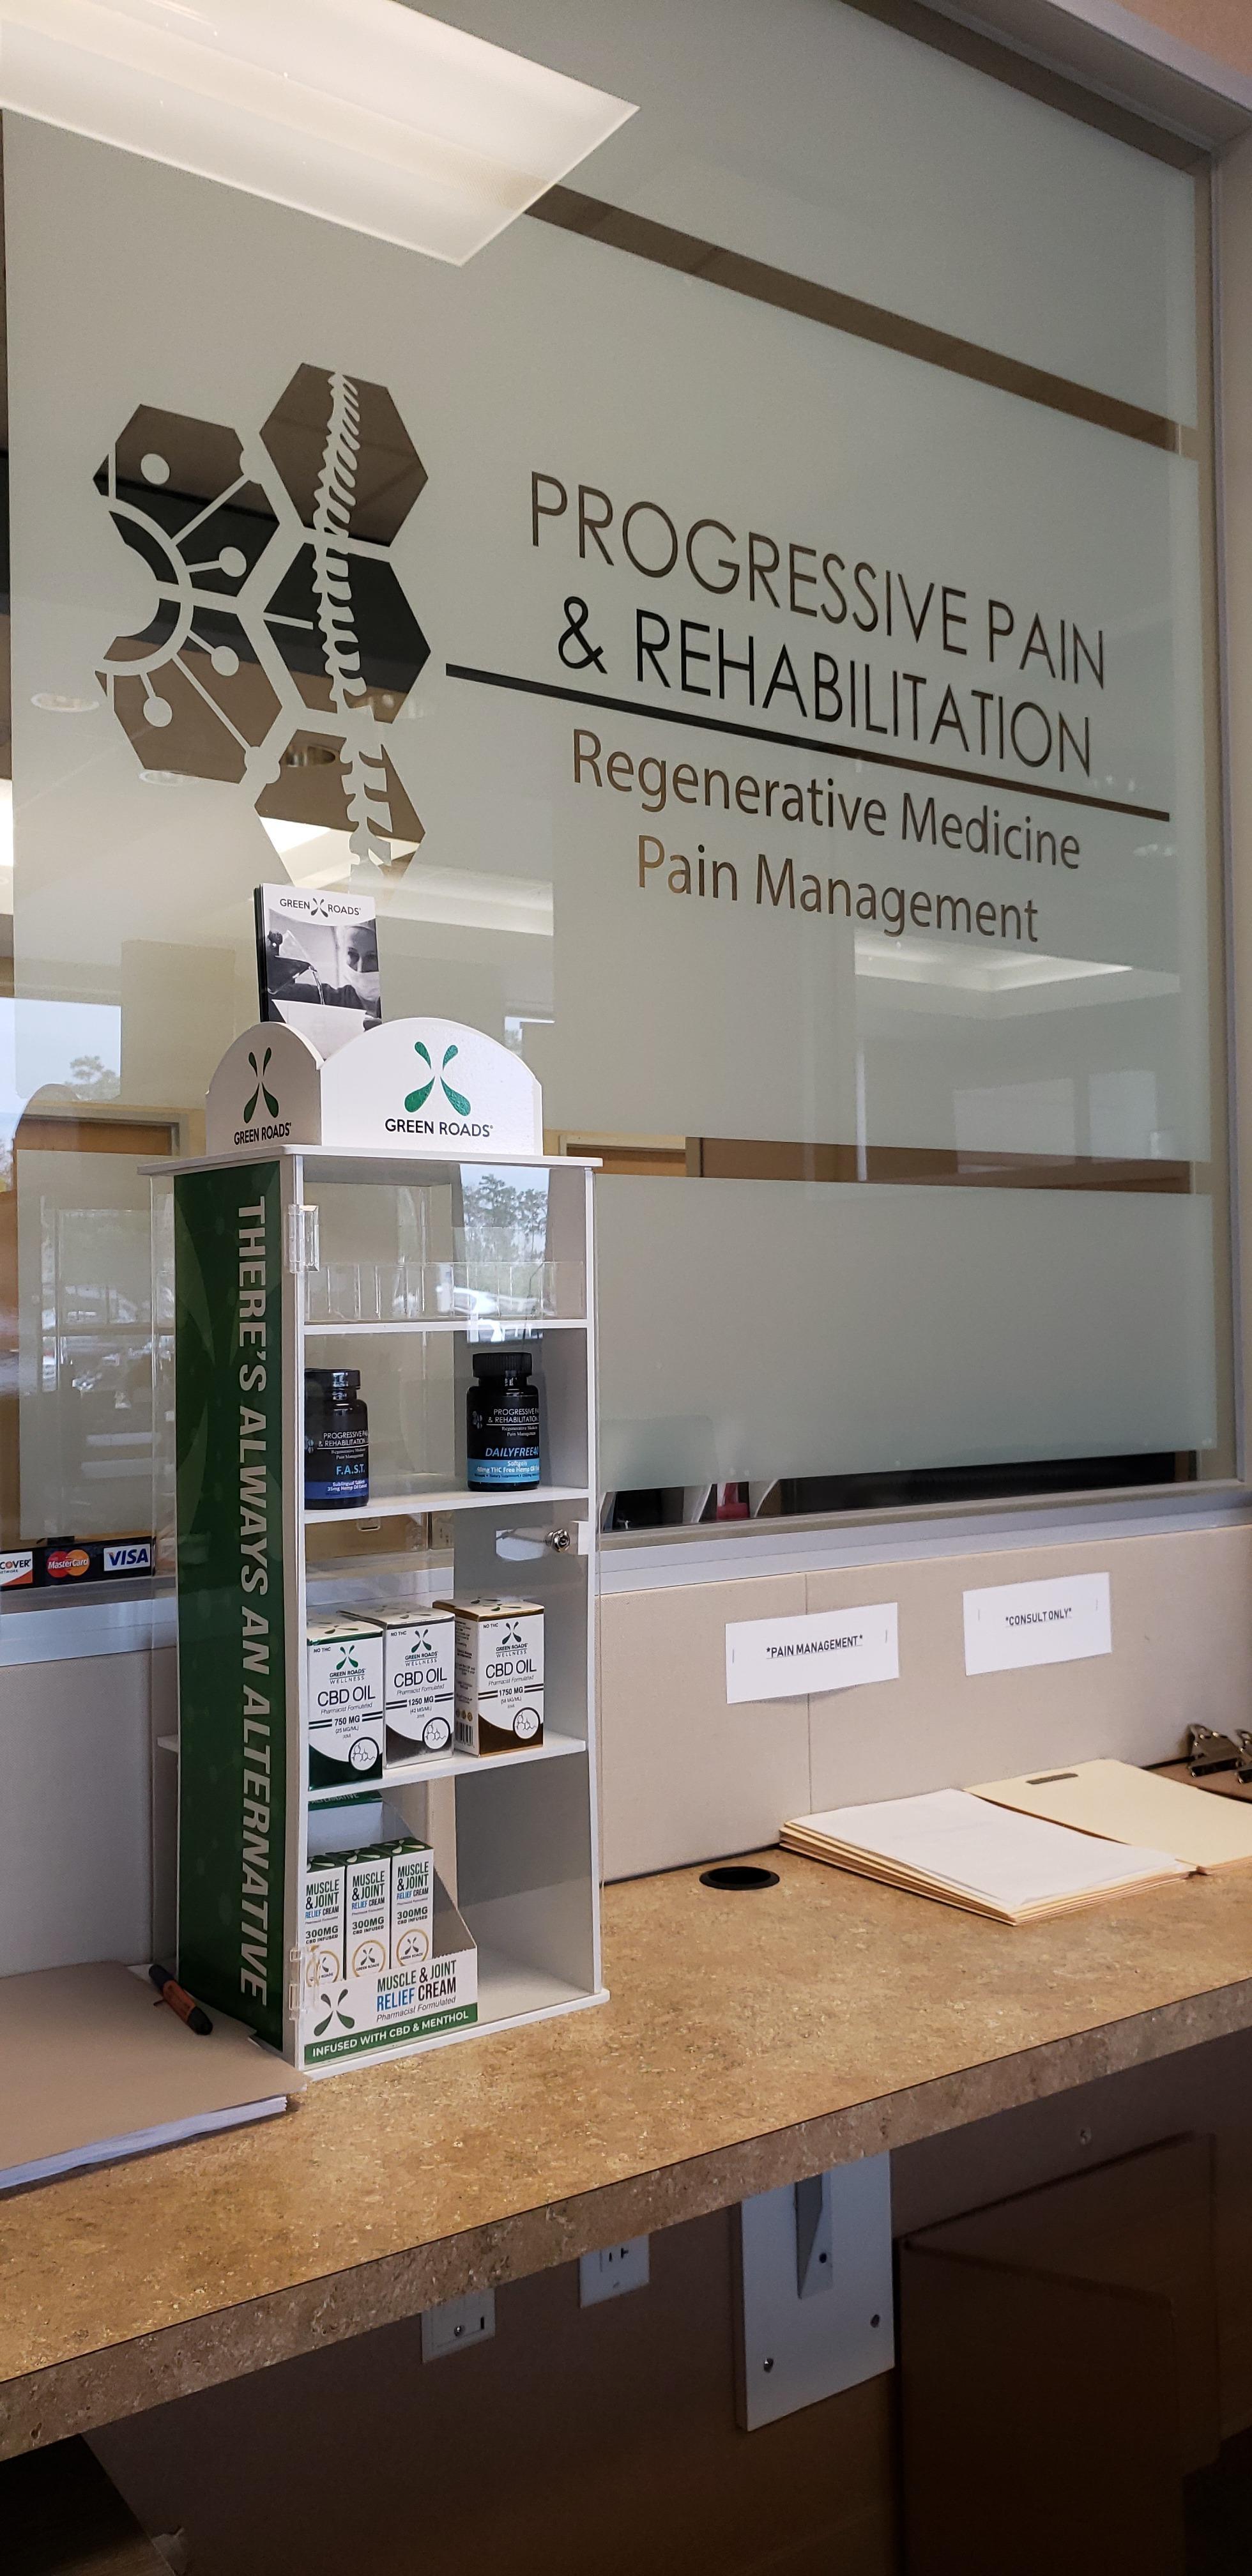 Progressive Pain and Rehabilitation image 4